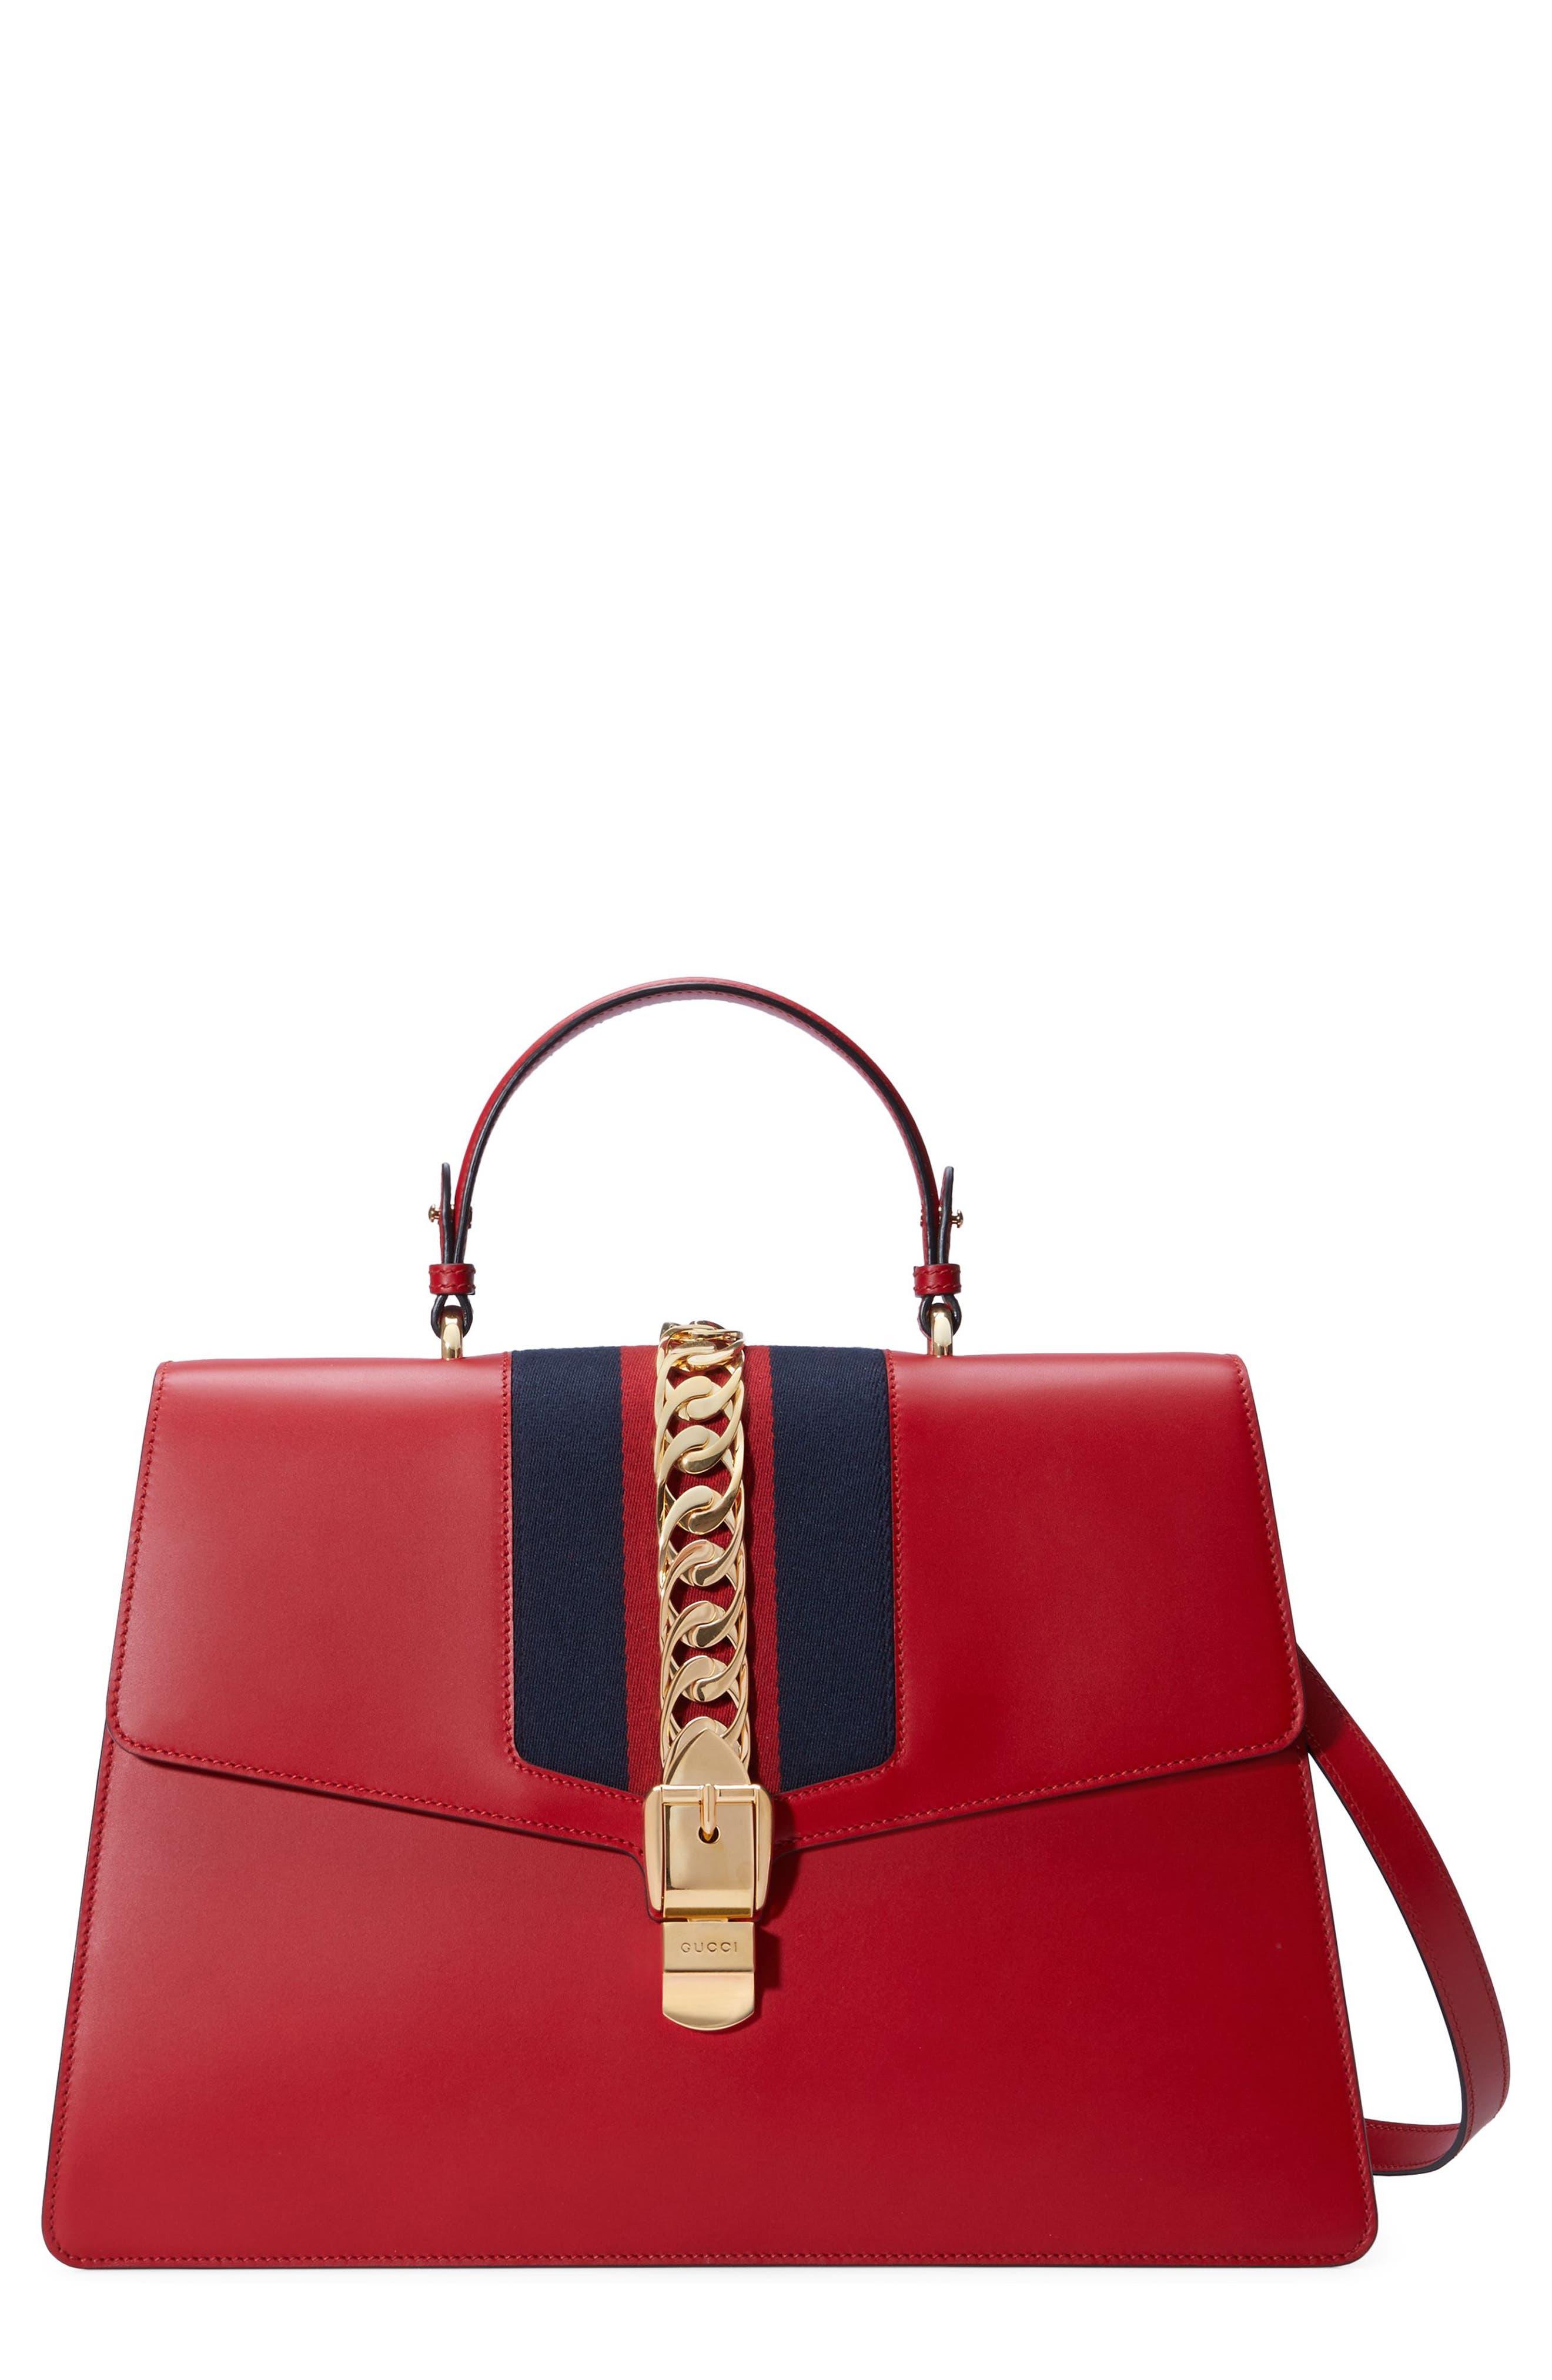 GUCCI Maxi Sylvie Top Handle Leather Shoulder Bag